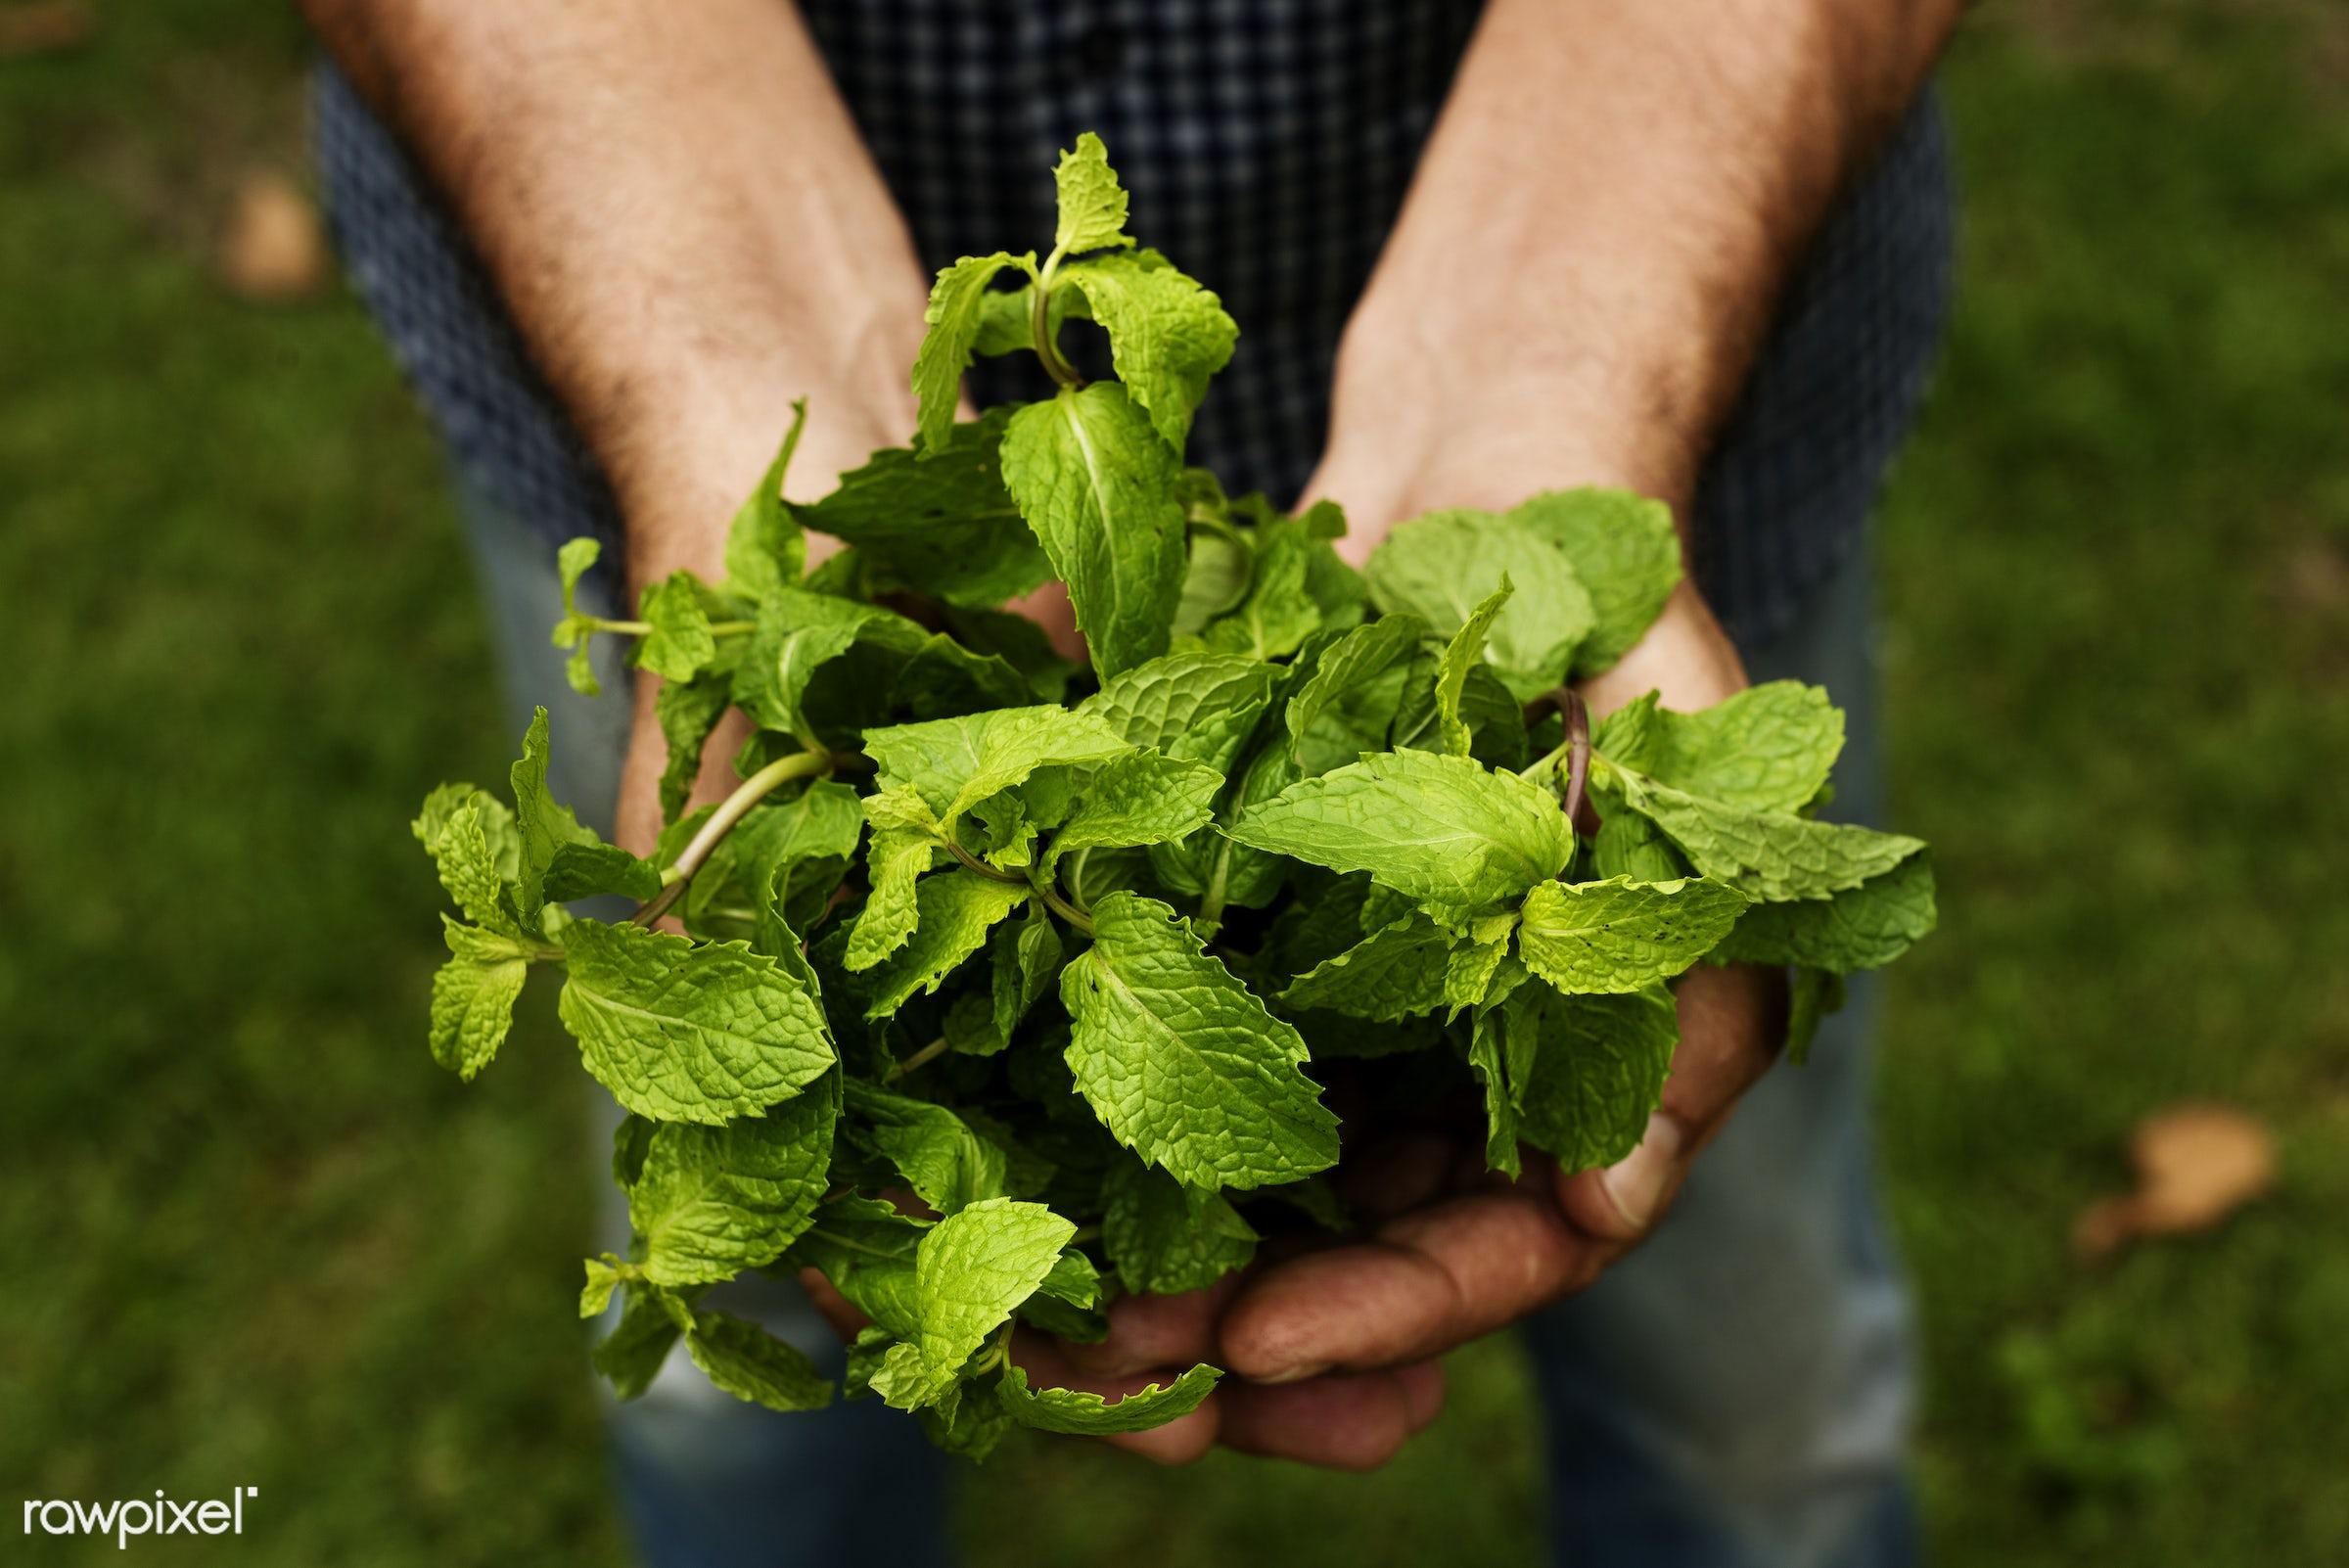 raw, holding, farm, nature, hands, fresh, closeup, peppermint, organic, healthy, harvest, produce